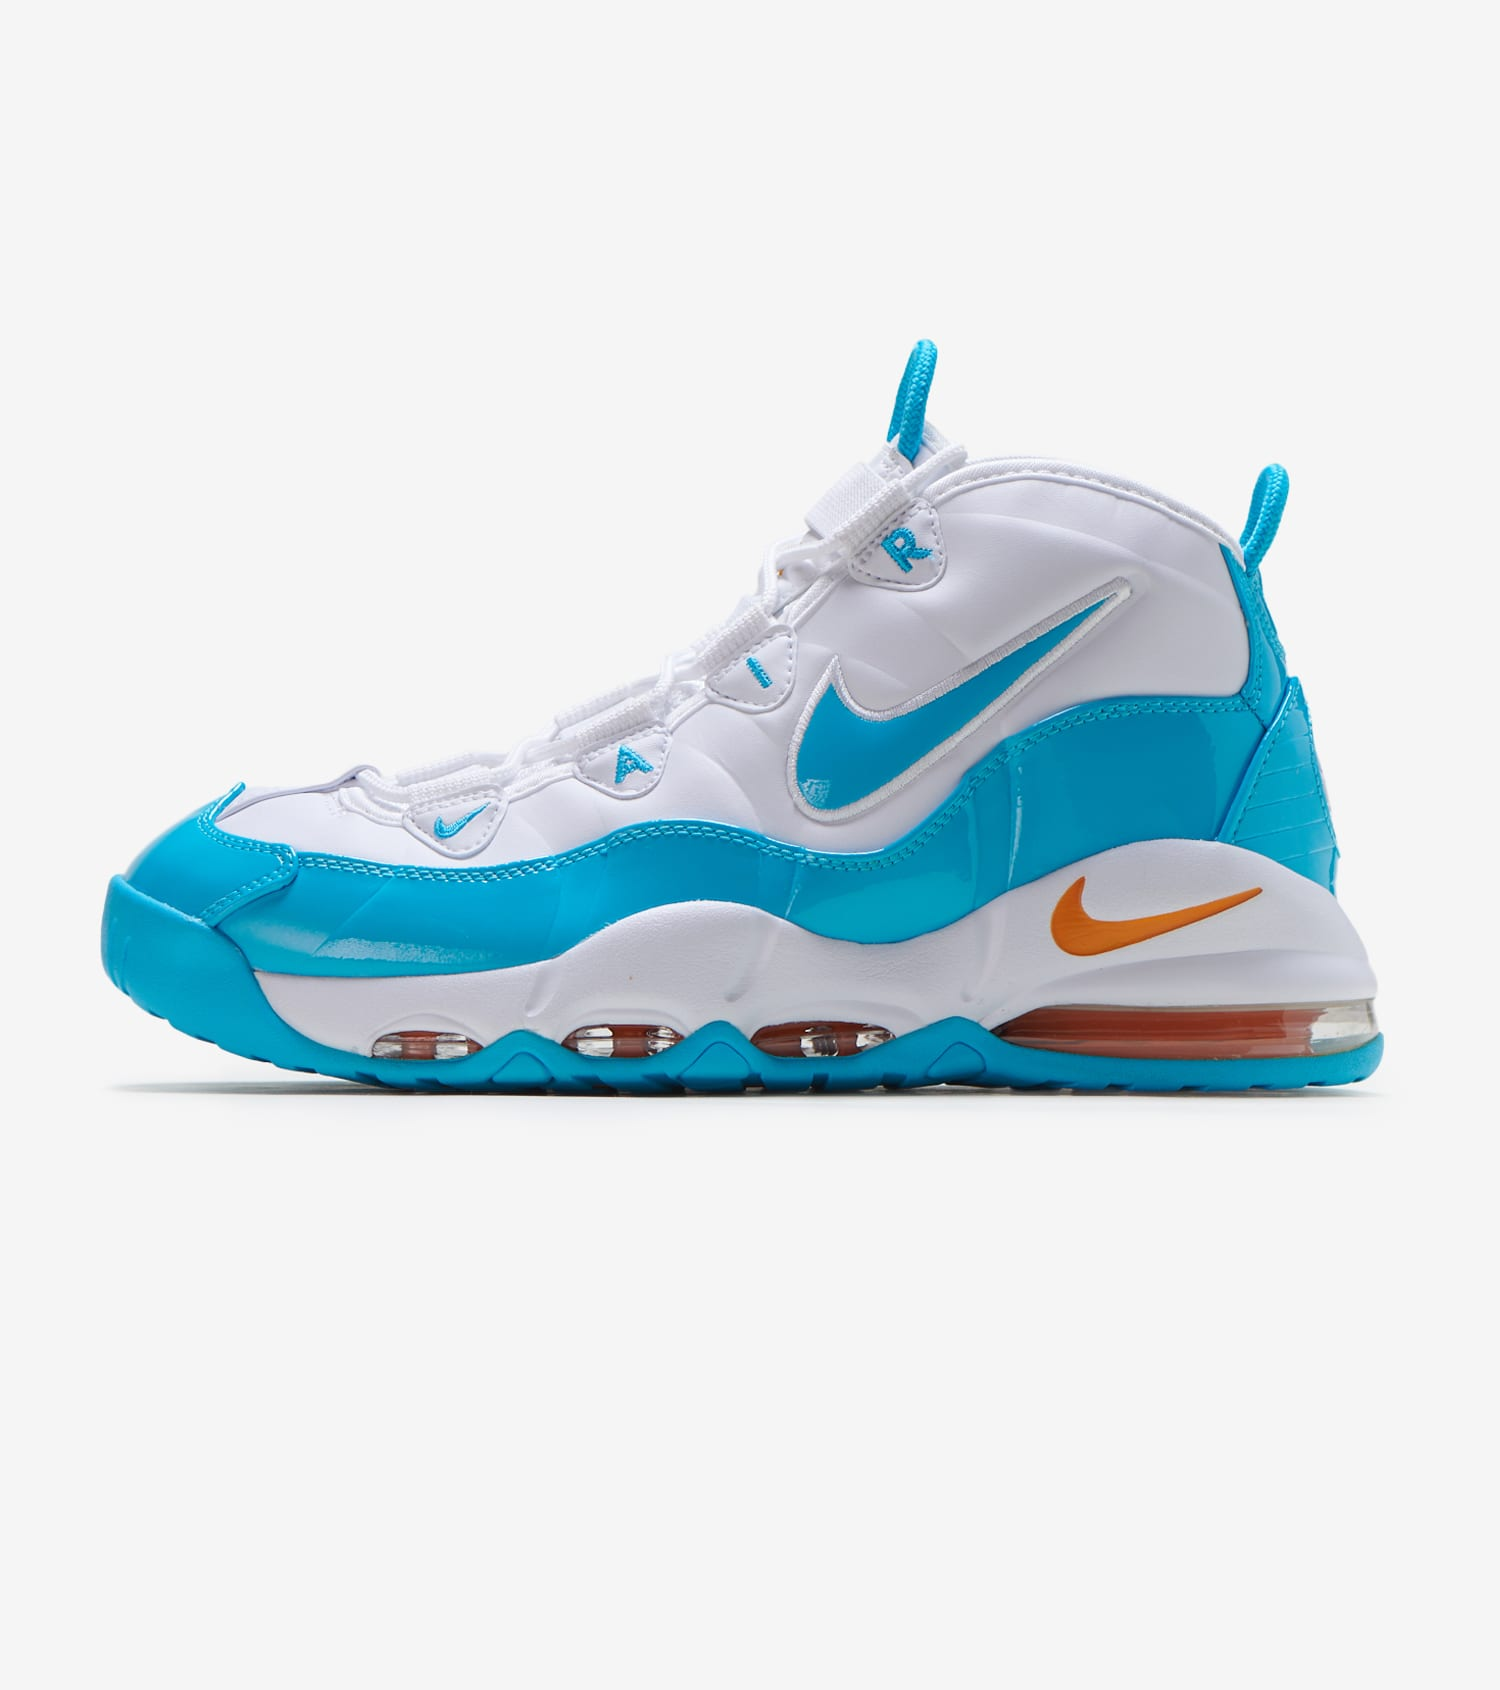 NIKE AIR DURATION Uptempo Herren Basketball Schuhe weiß blau